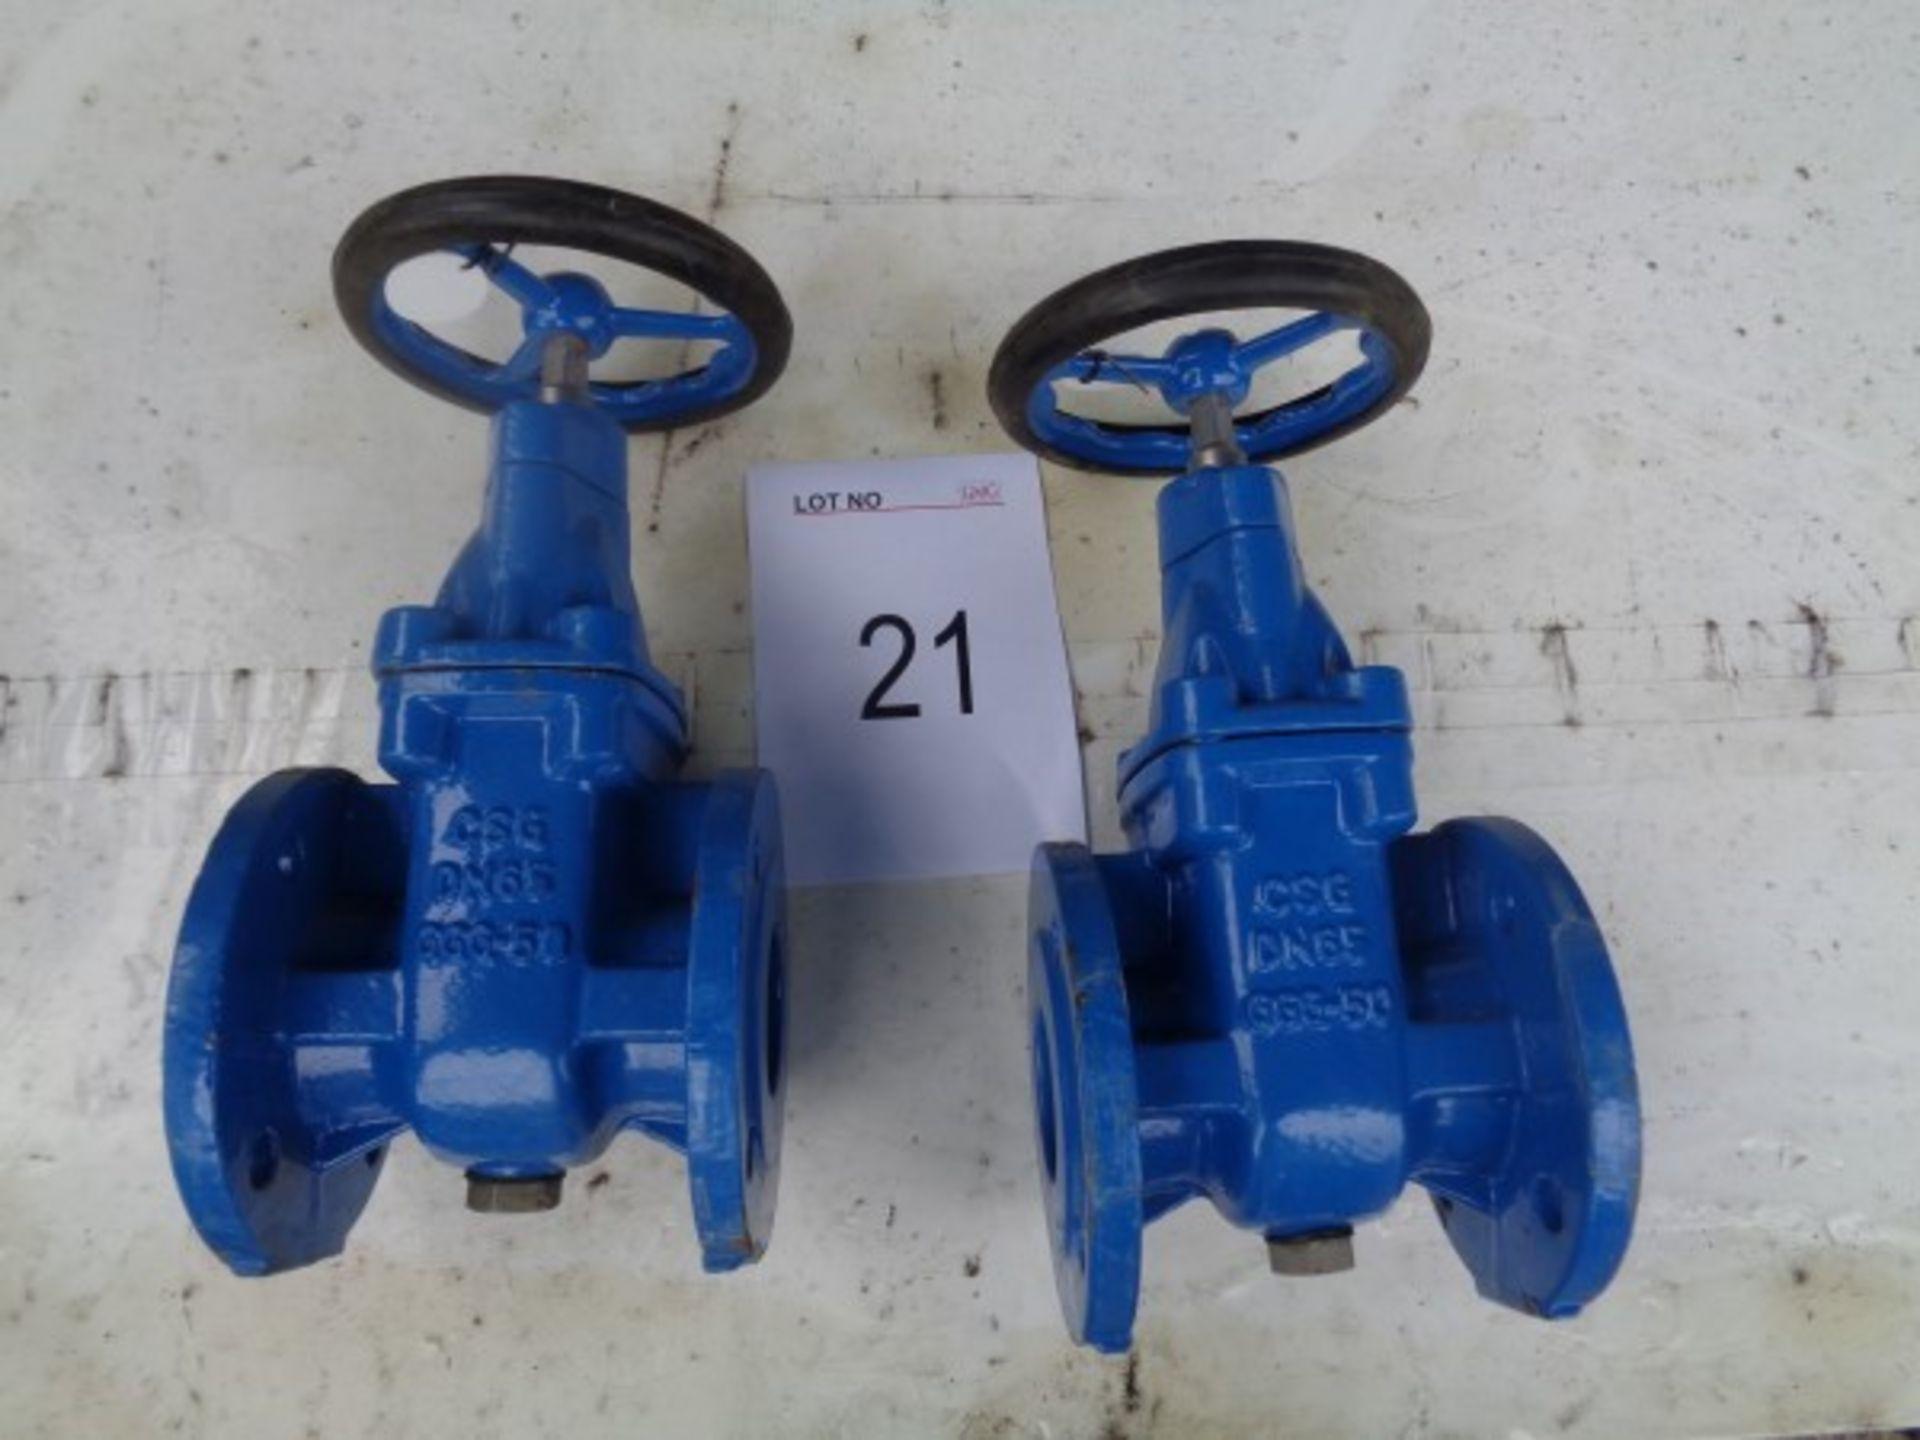 2 x CSG DN65 GGG 50 gate valves